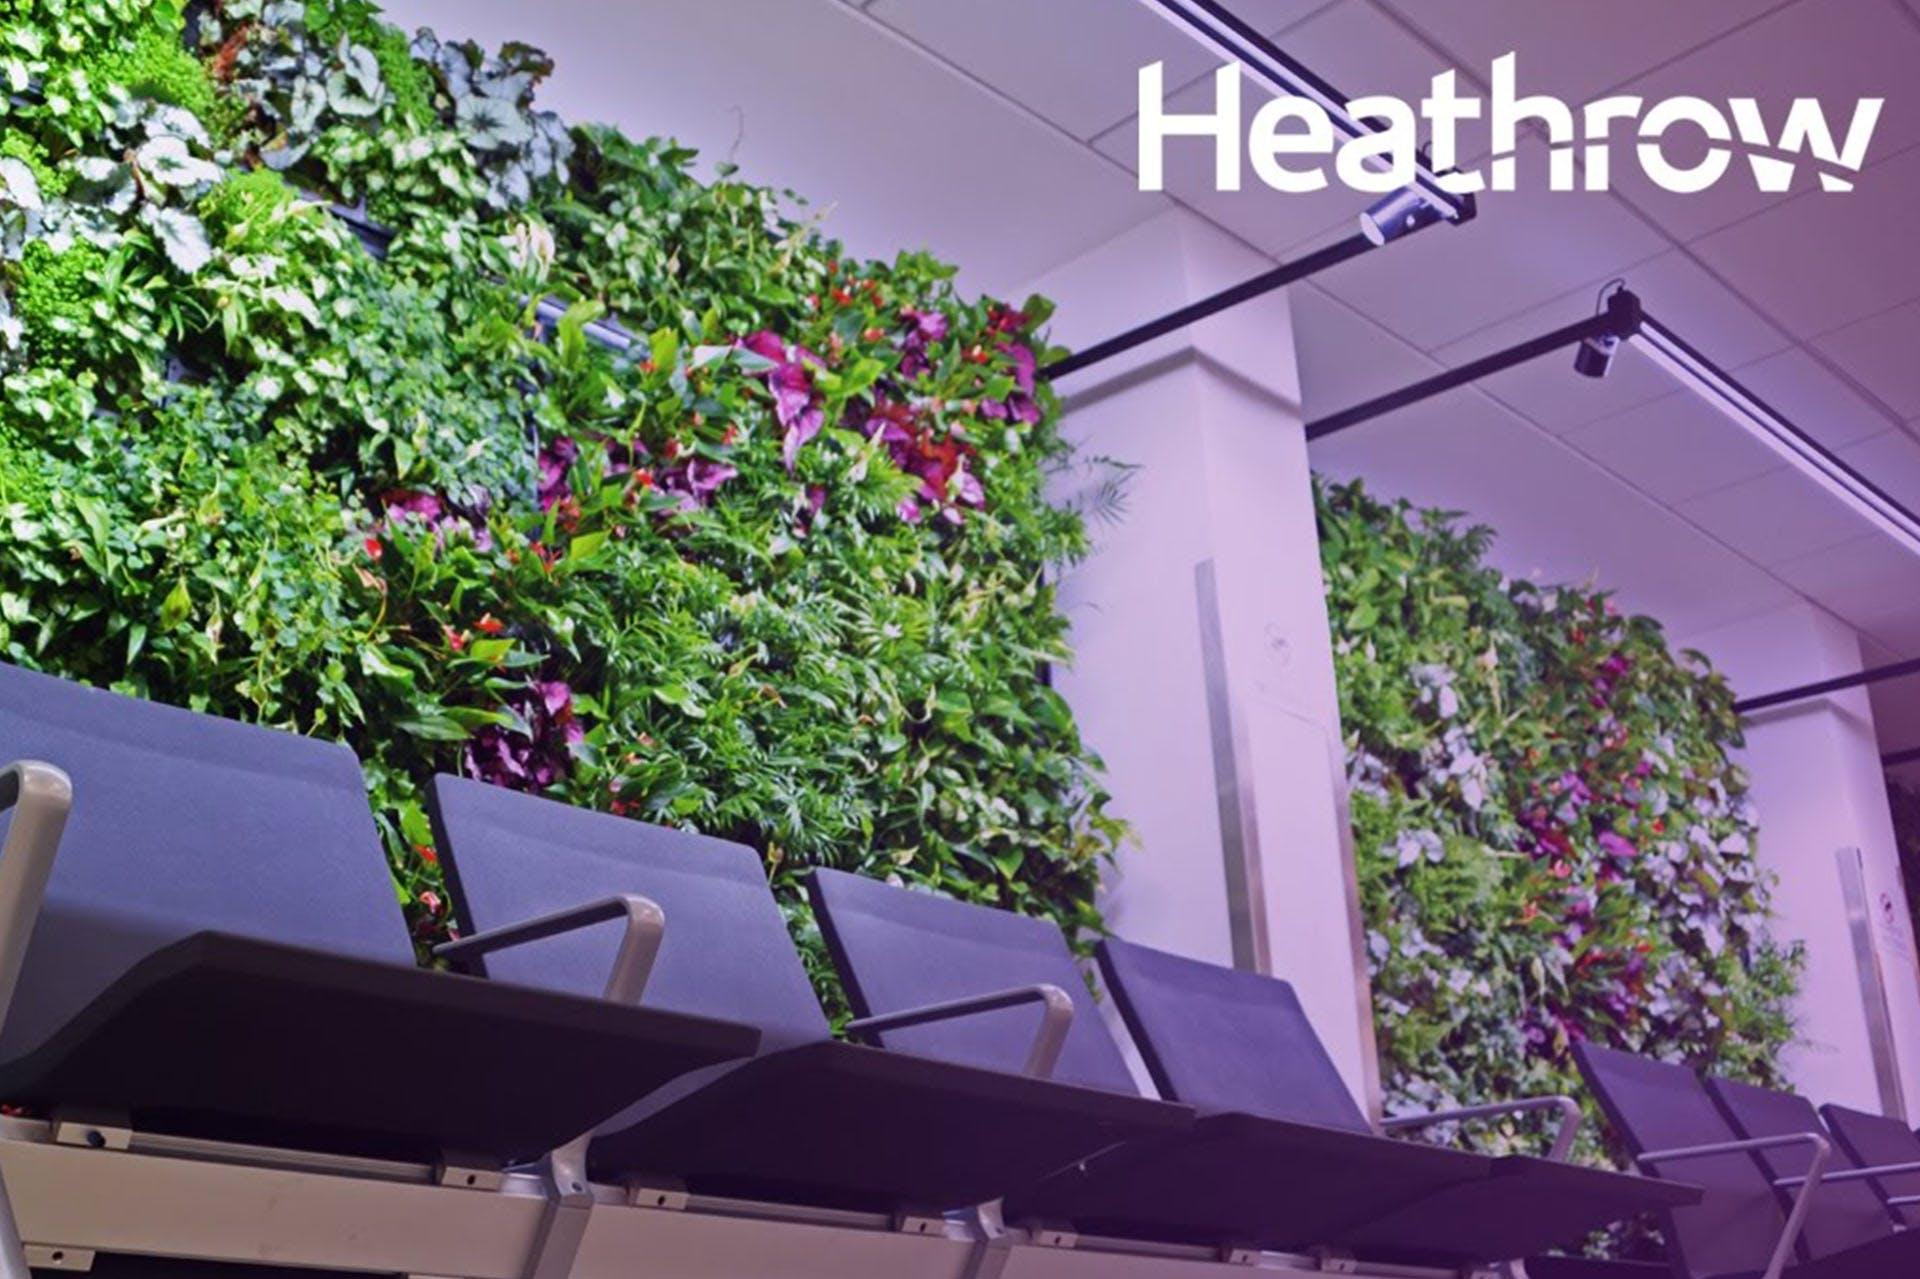 Image of Heathrow's eco wall